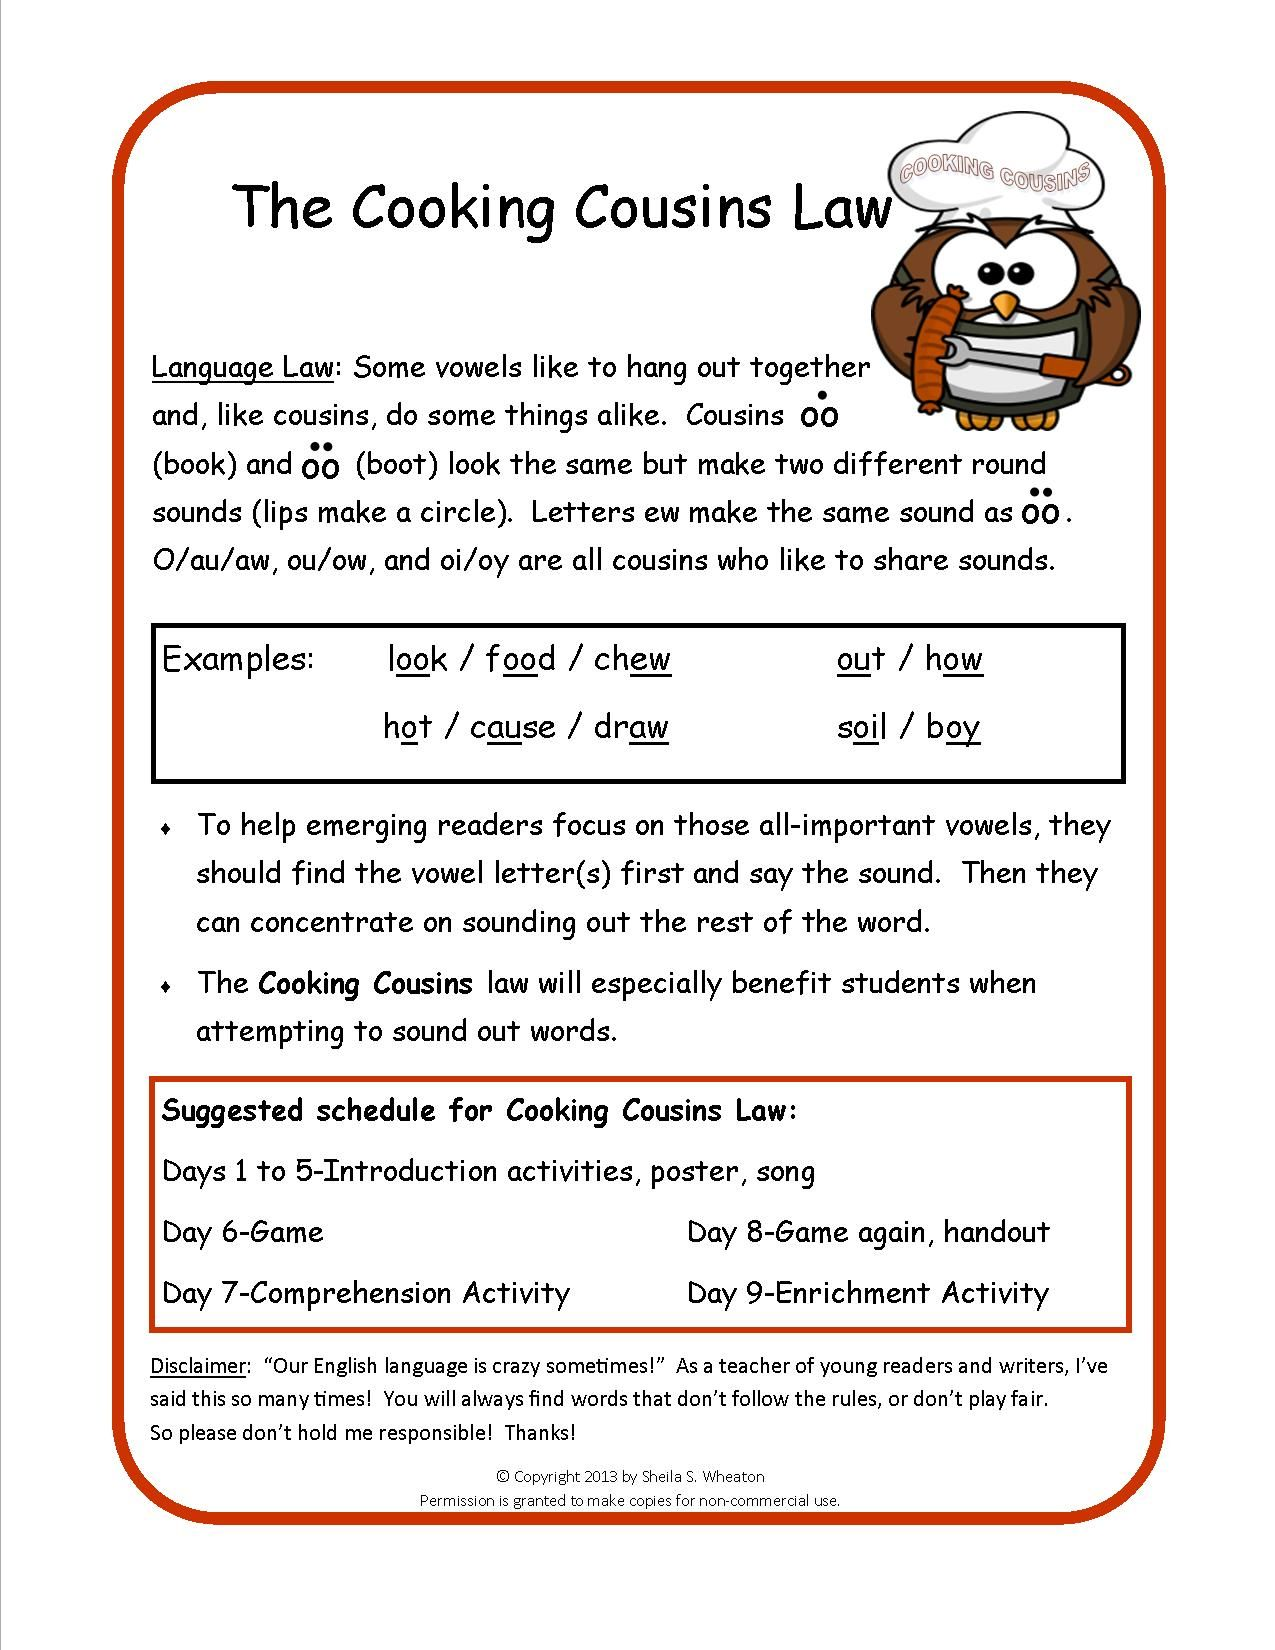 Language Law 8 Cooking Cousins